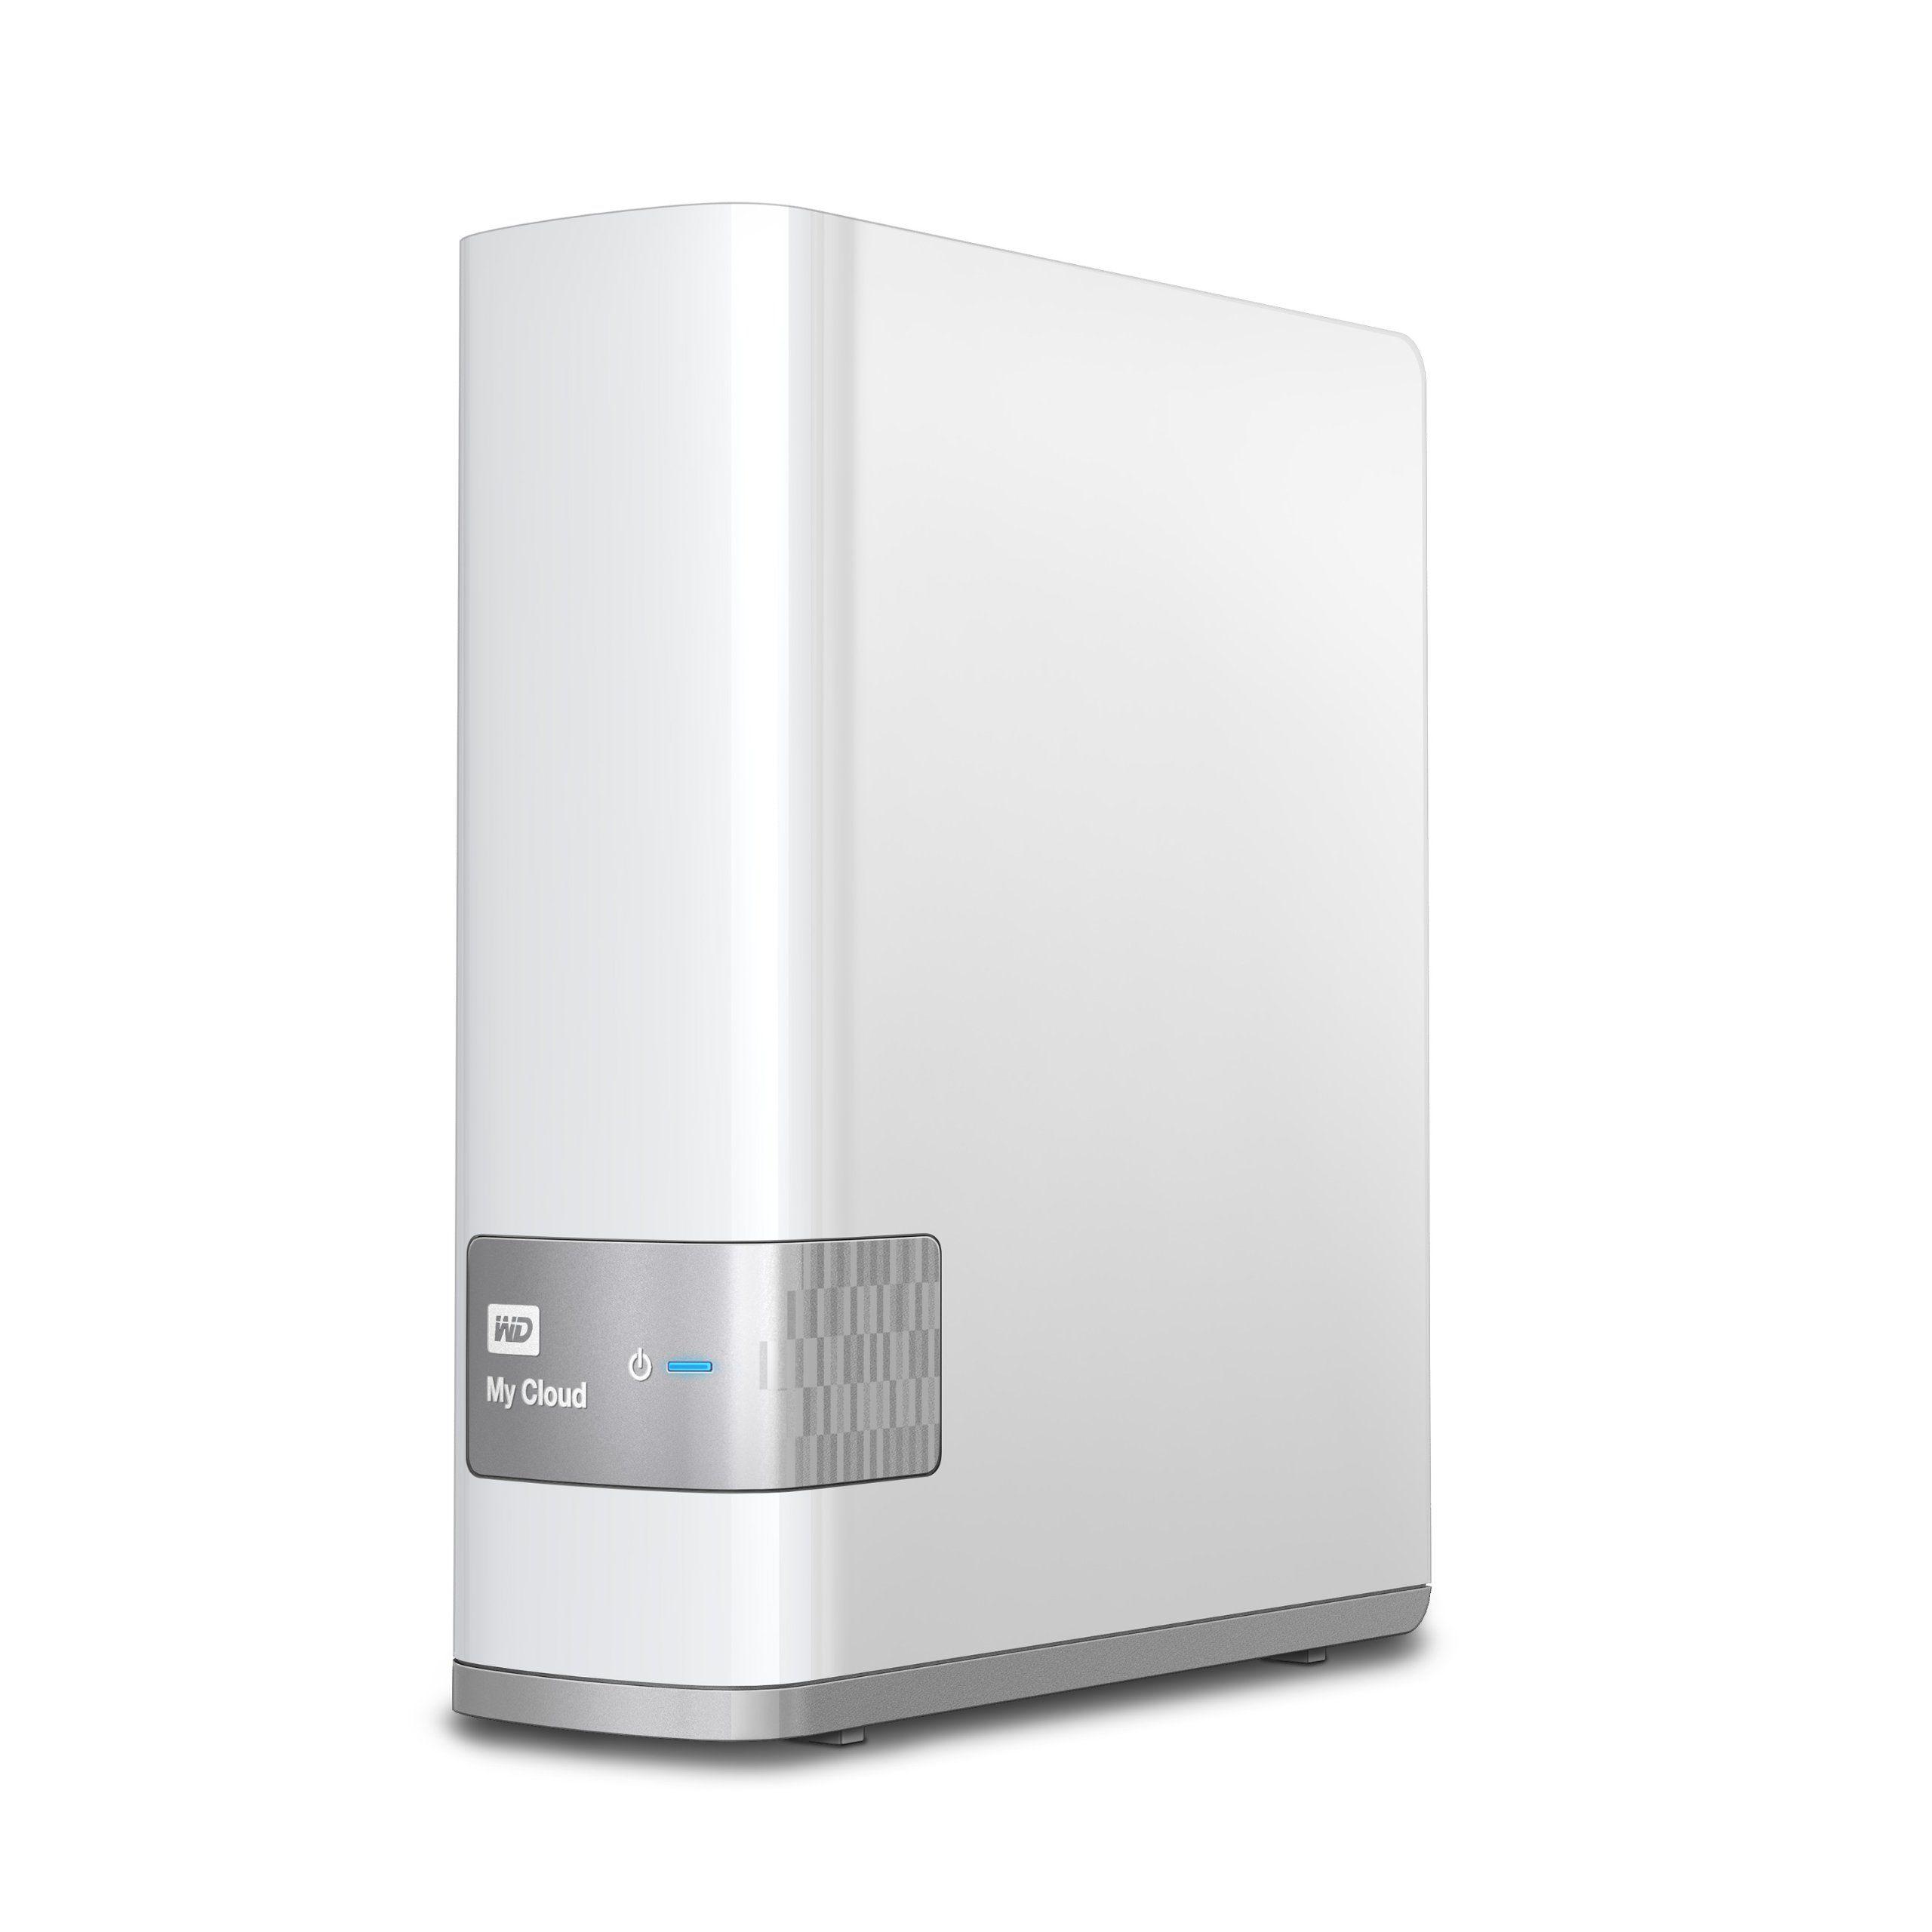 Wd 2tb My Cloud Personal Cloud Storage Nas 115 Cloud Storage Personal Storage Storage